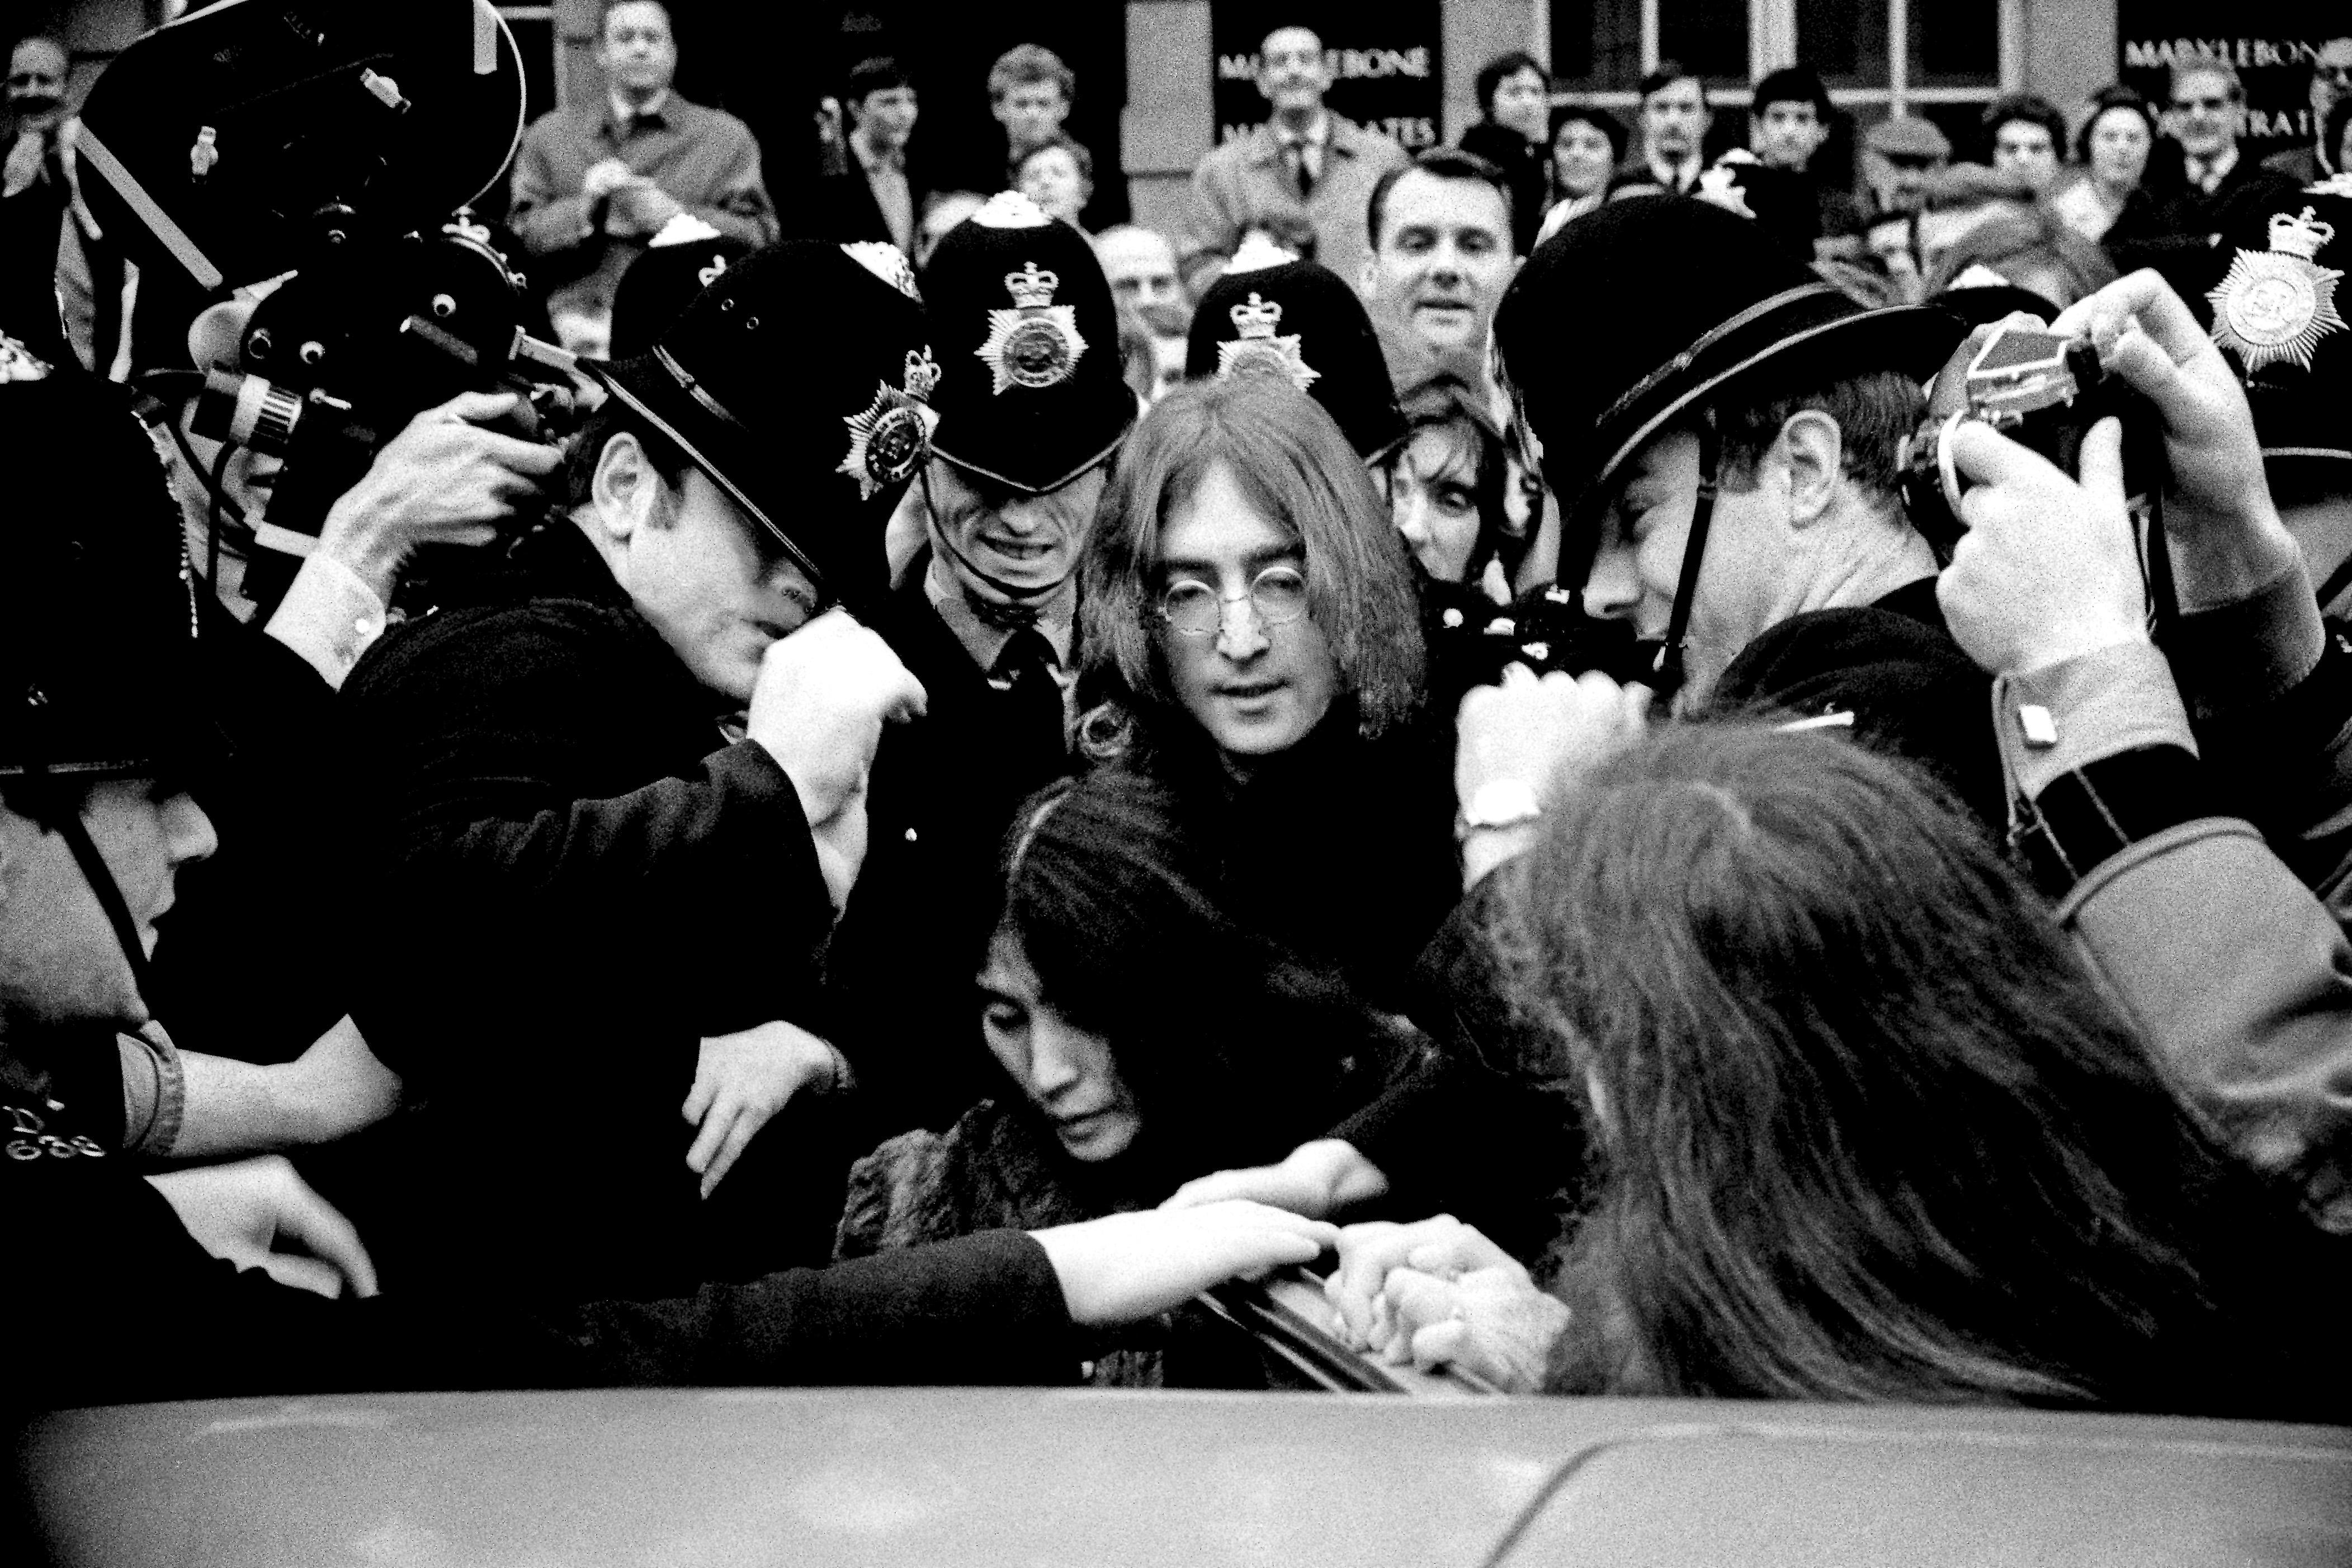 John Lennon: The Rolling Stone Interview